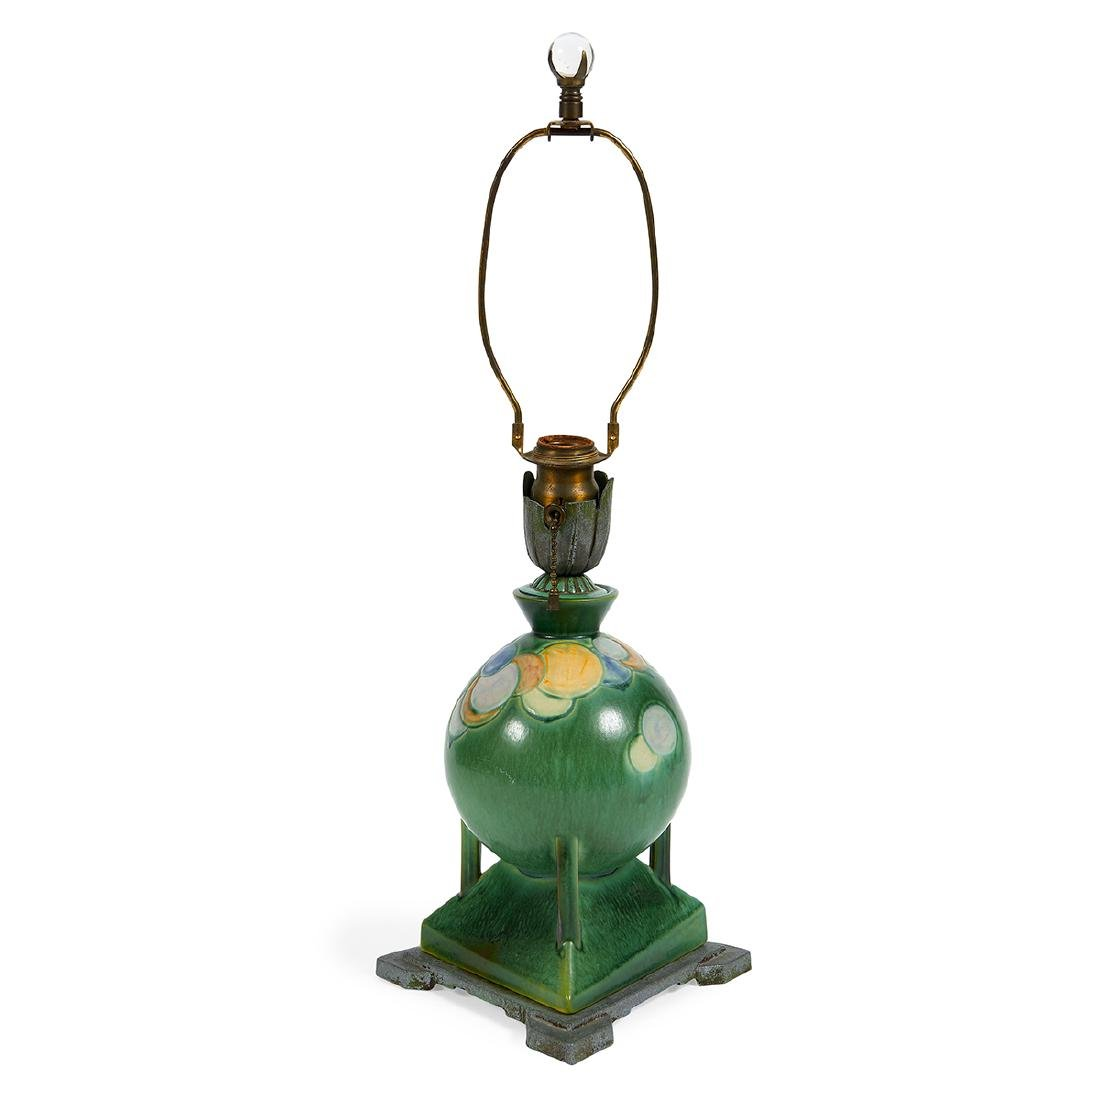 Roseville Pottery Co., Futura Vase Lamp